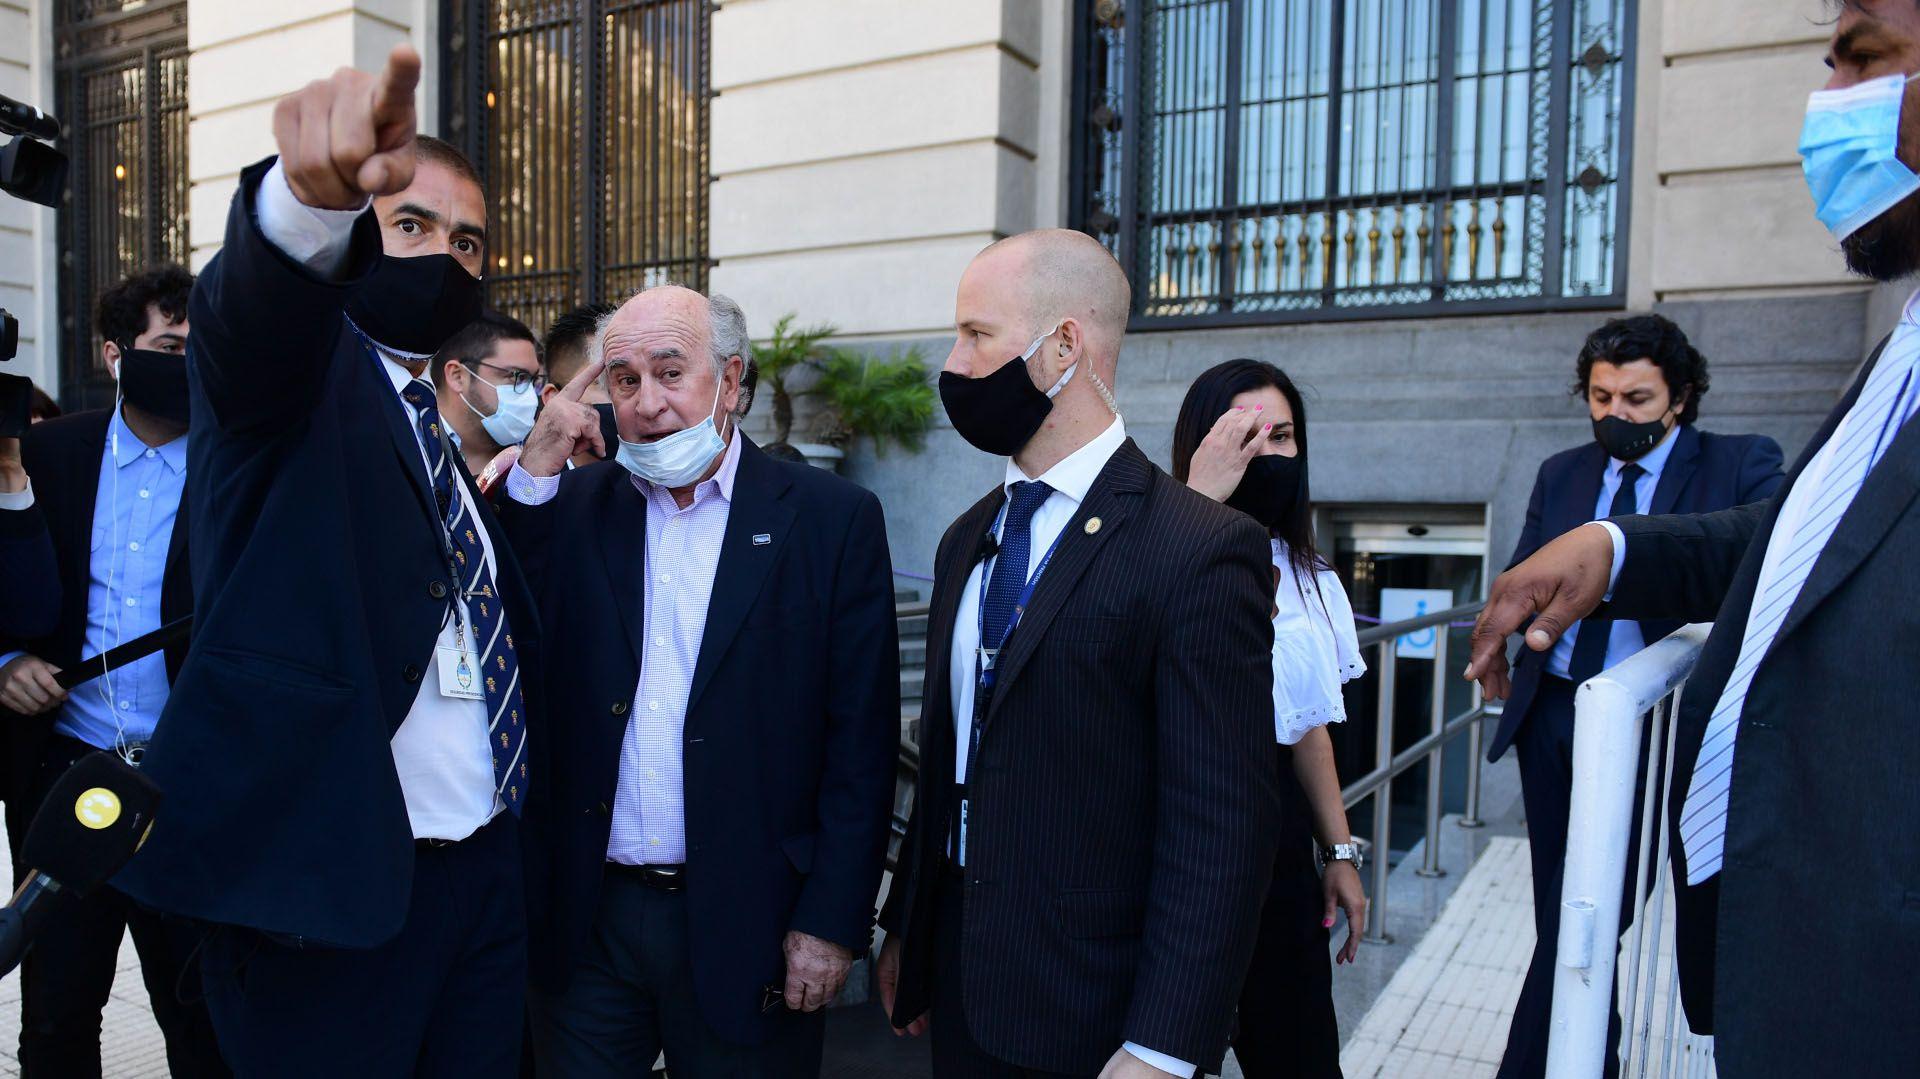 Acto Homenaje Néstor Kirchner - CCK